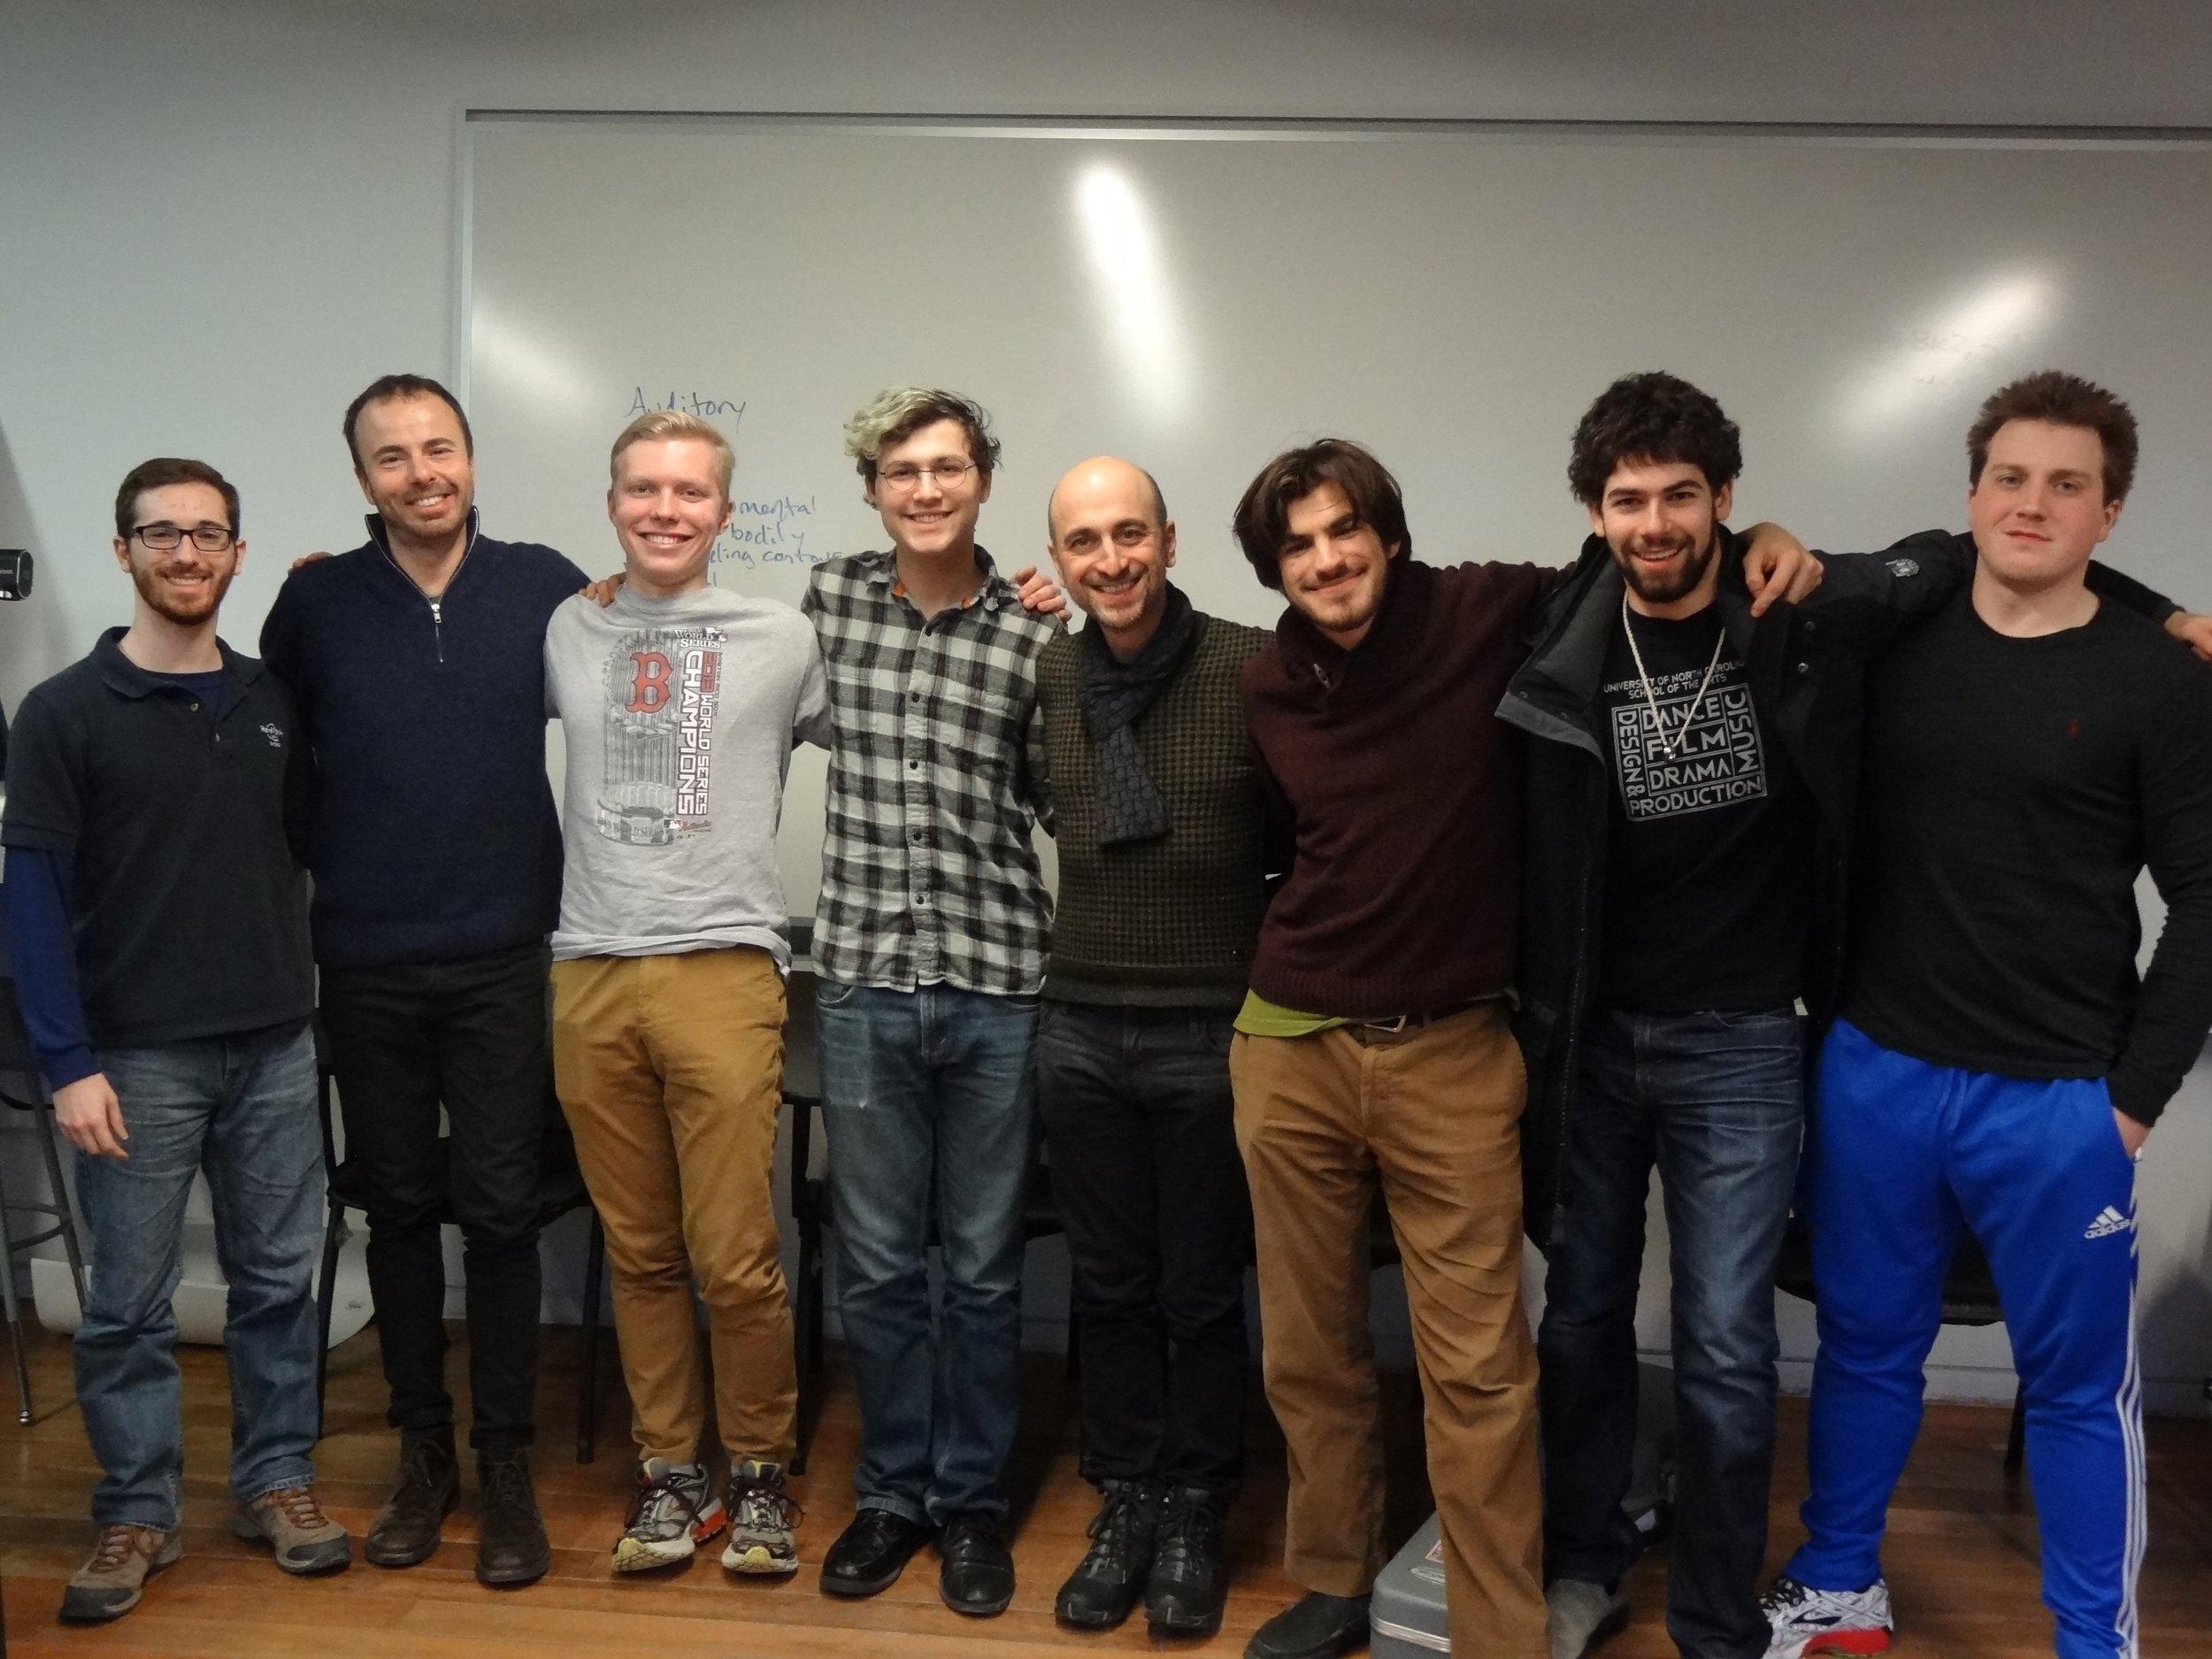 Brian King, Lorenzo Micheli, Aidan Lippke, Jonathan Bodian, Matteo Mela, Mohit Dubey, Collin Sterne and Stephen Fazio, after master class.